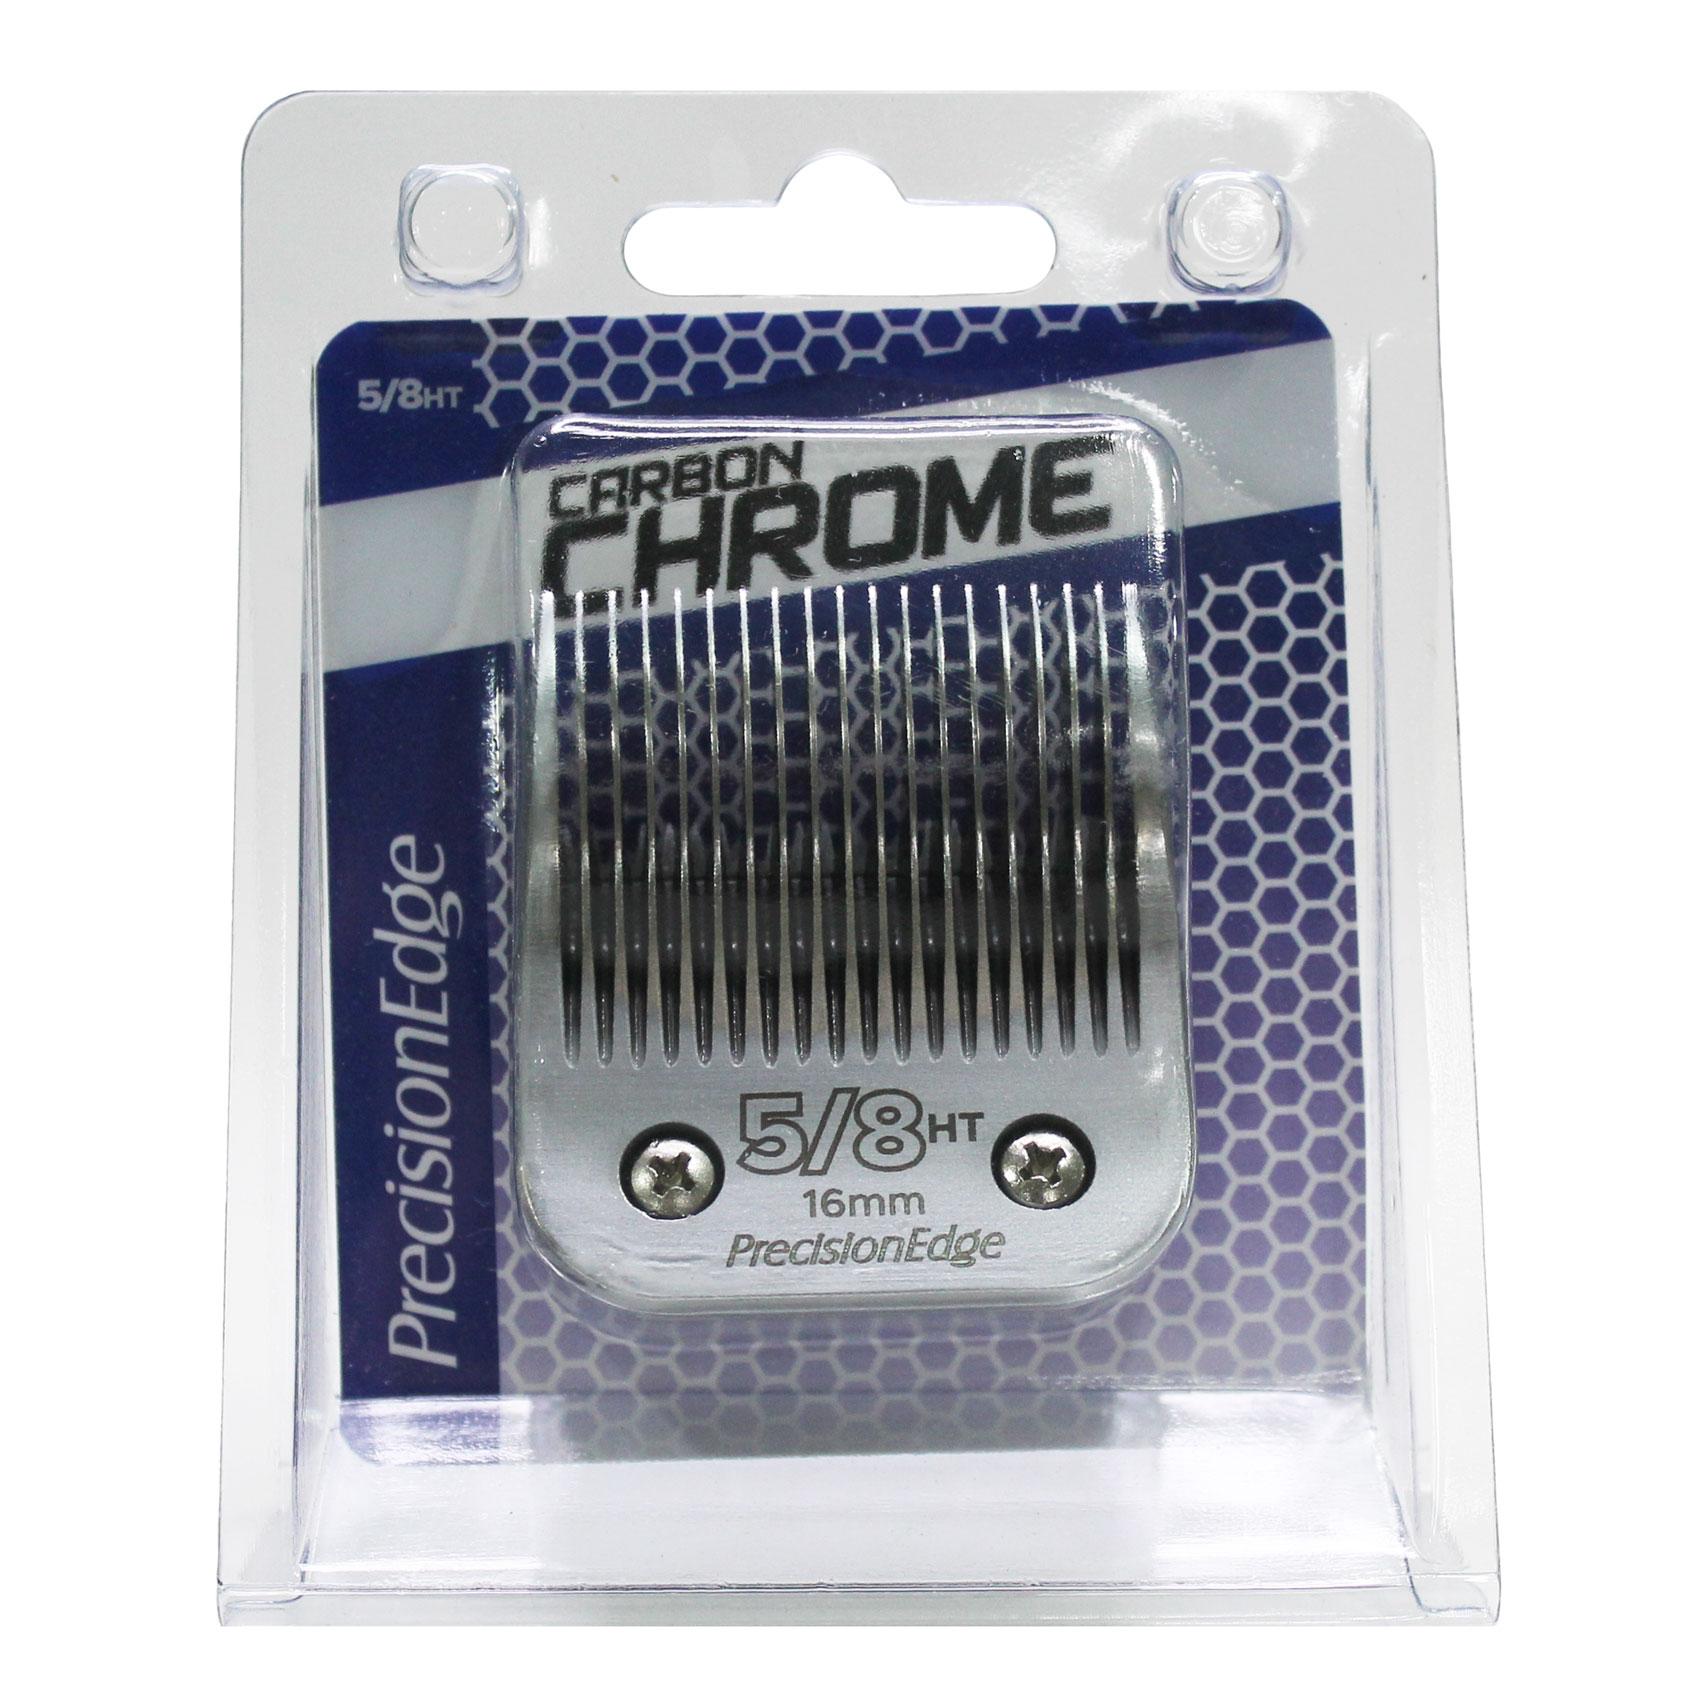 Lâmina Precision Edge Carbon Chrome 5/8 - 16mm